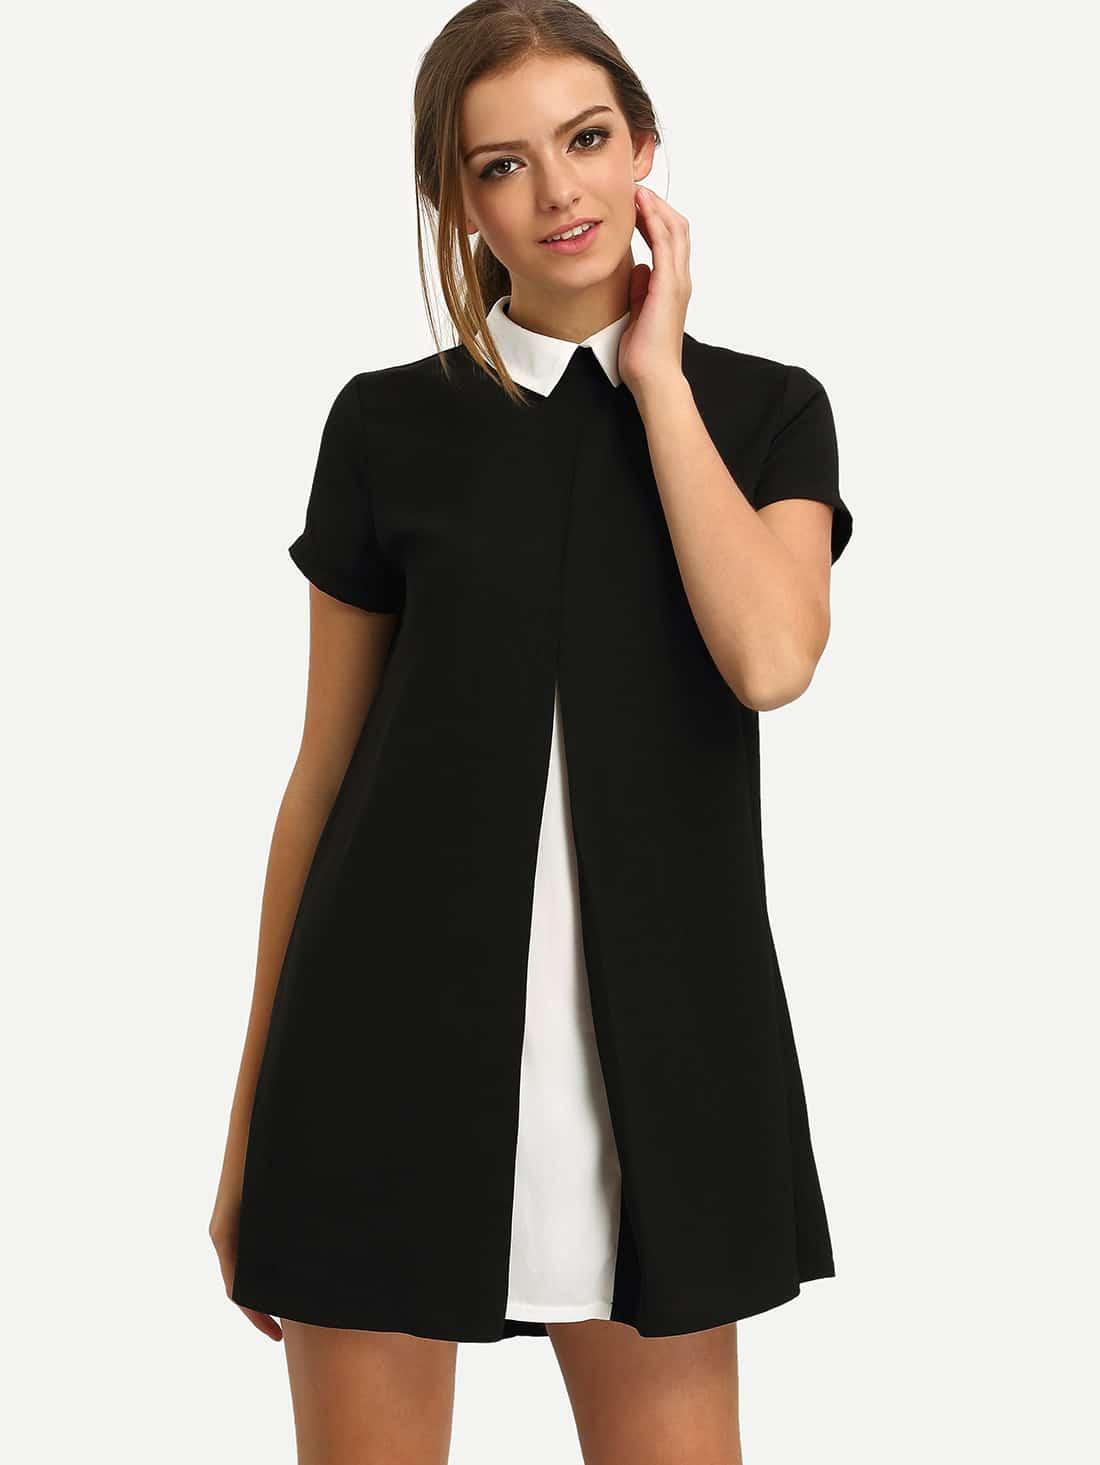 Black White Contrast Collared Spliced Dress dress160408702